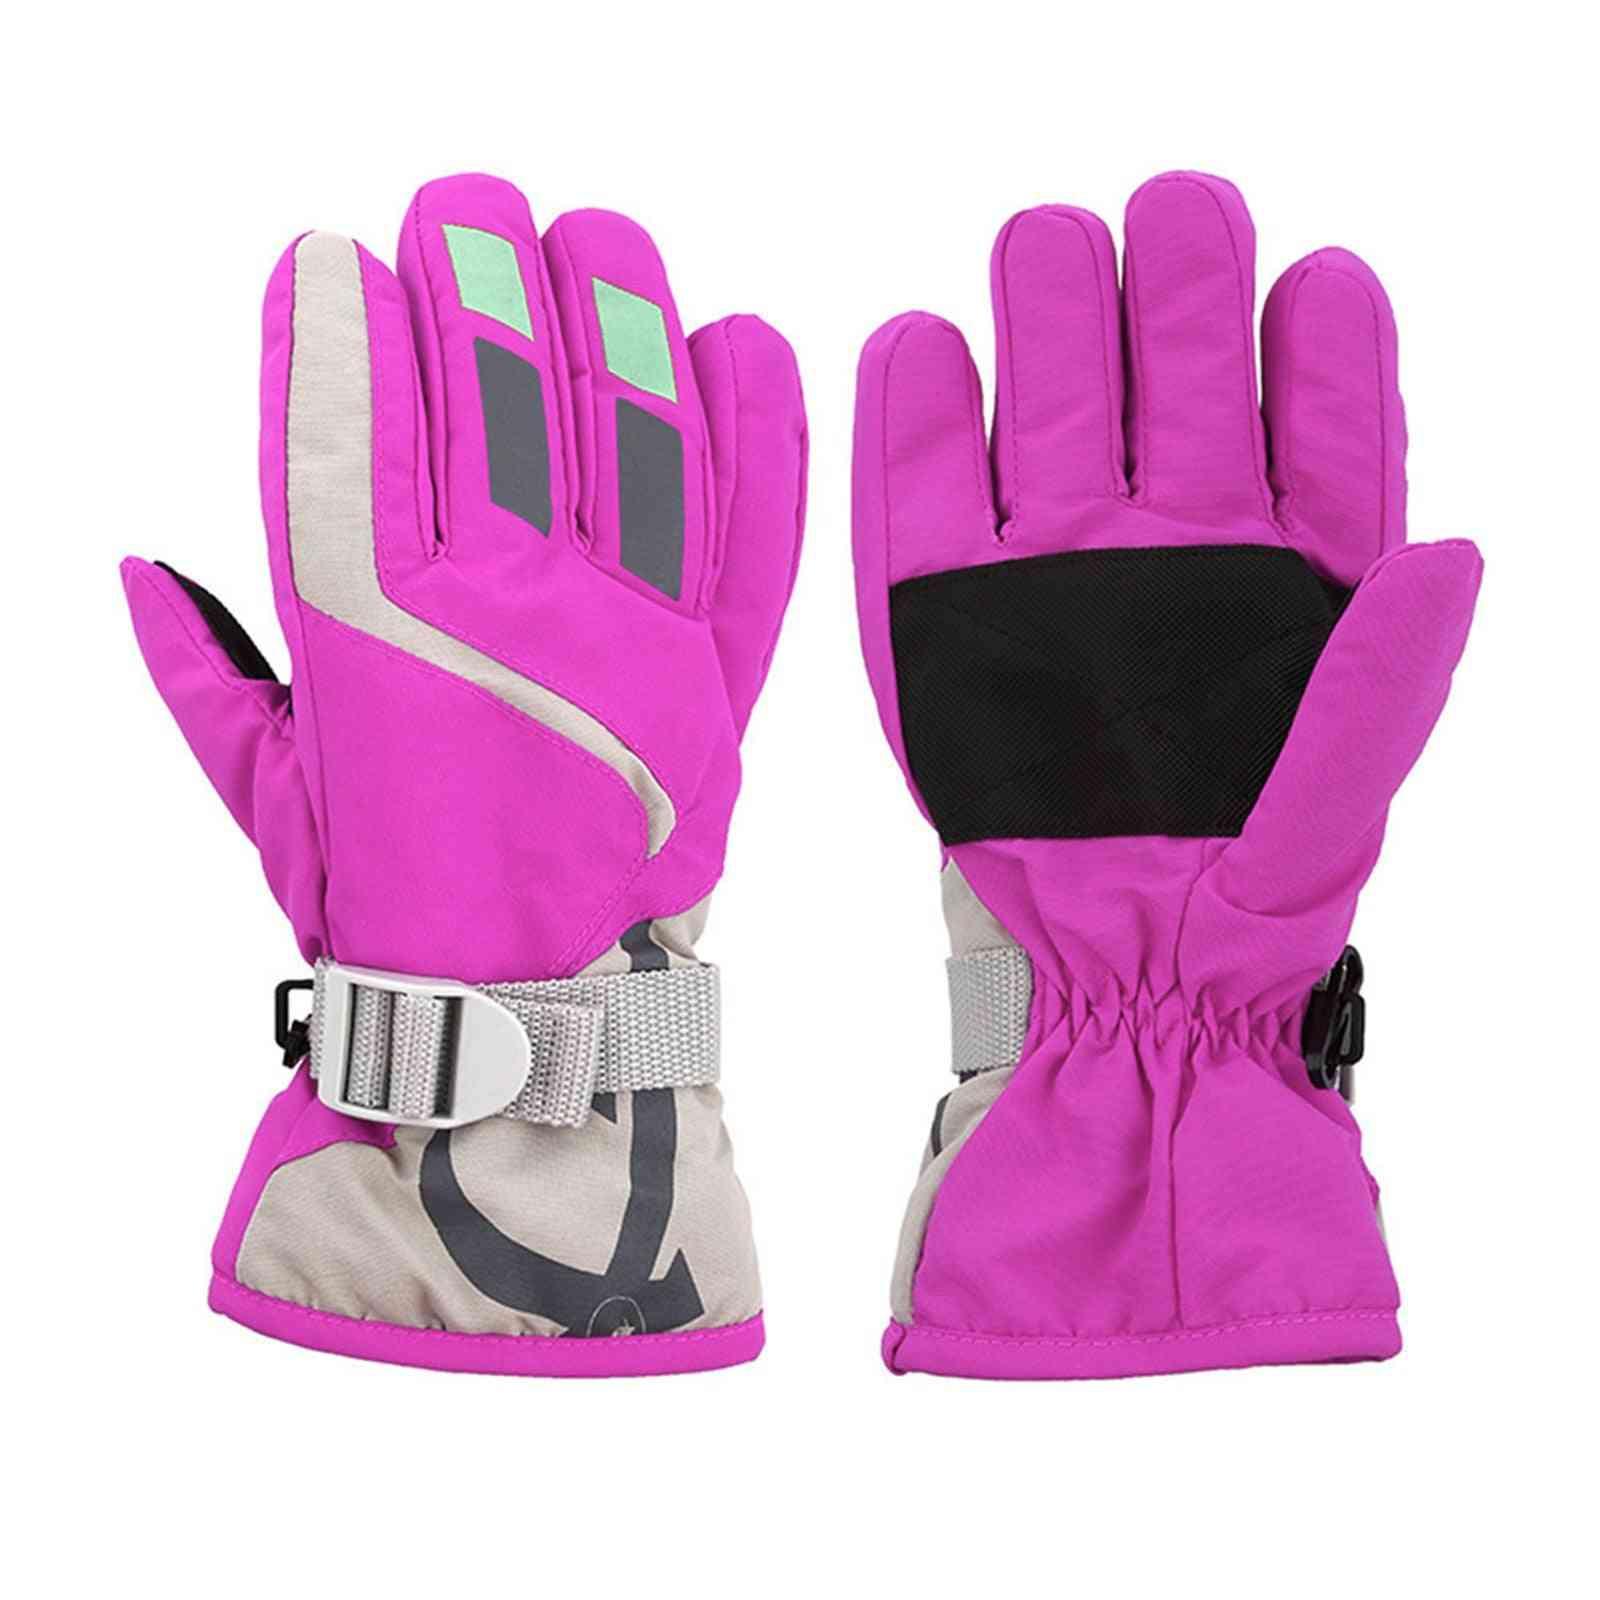 Kids Winter Warm Waterproof Windproof Thick Ski Gloves